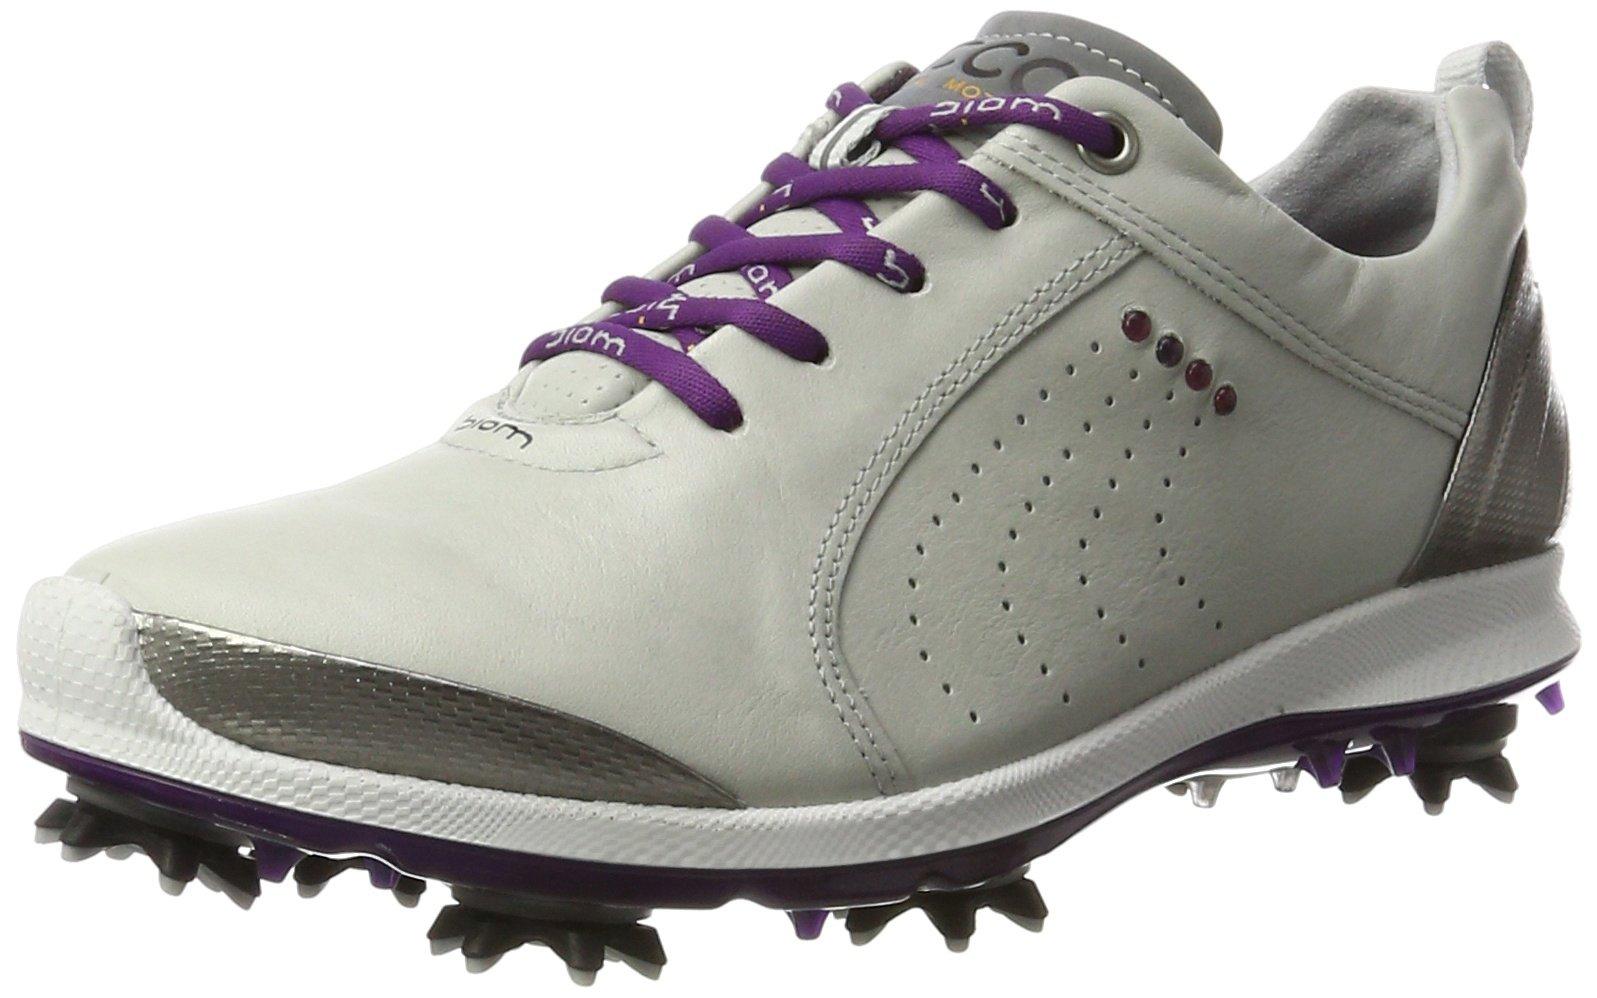 ECCO Women's Boim G 2 Free Golf Shoe, Concrete/Imperial Purple, 42 EU/11-11.5 M US